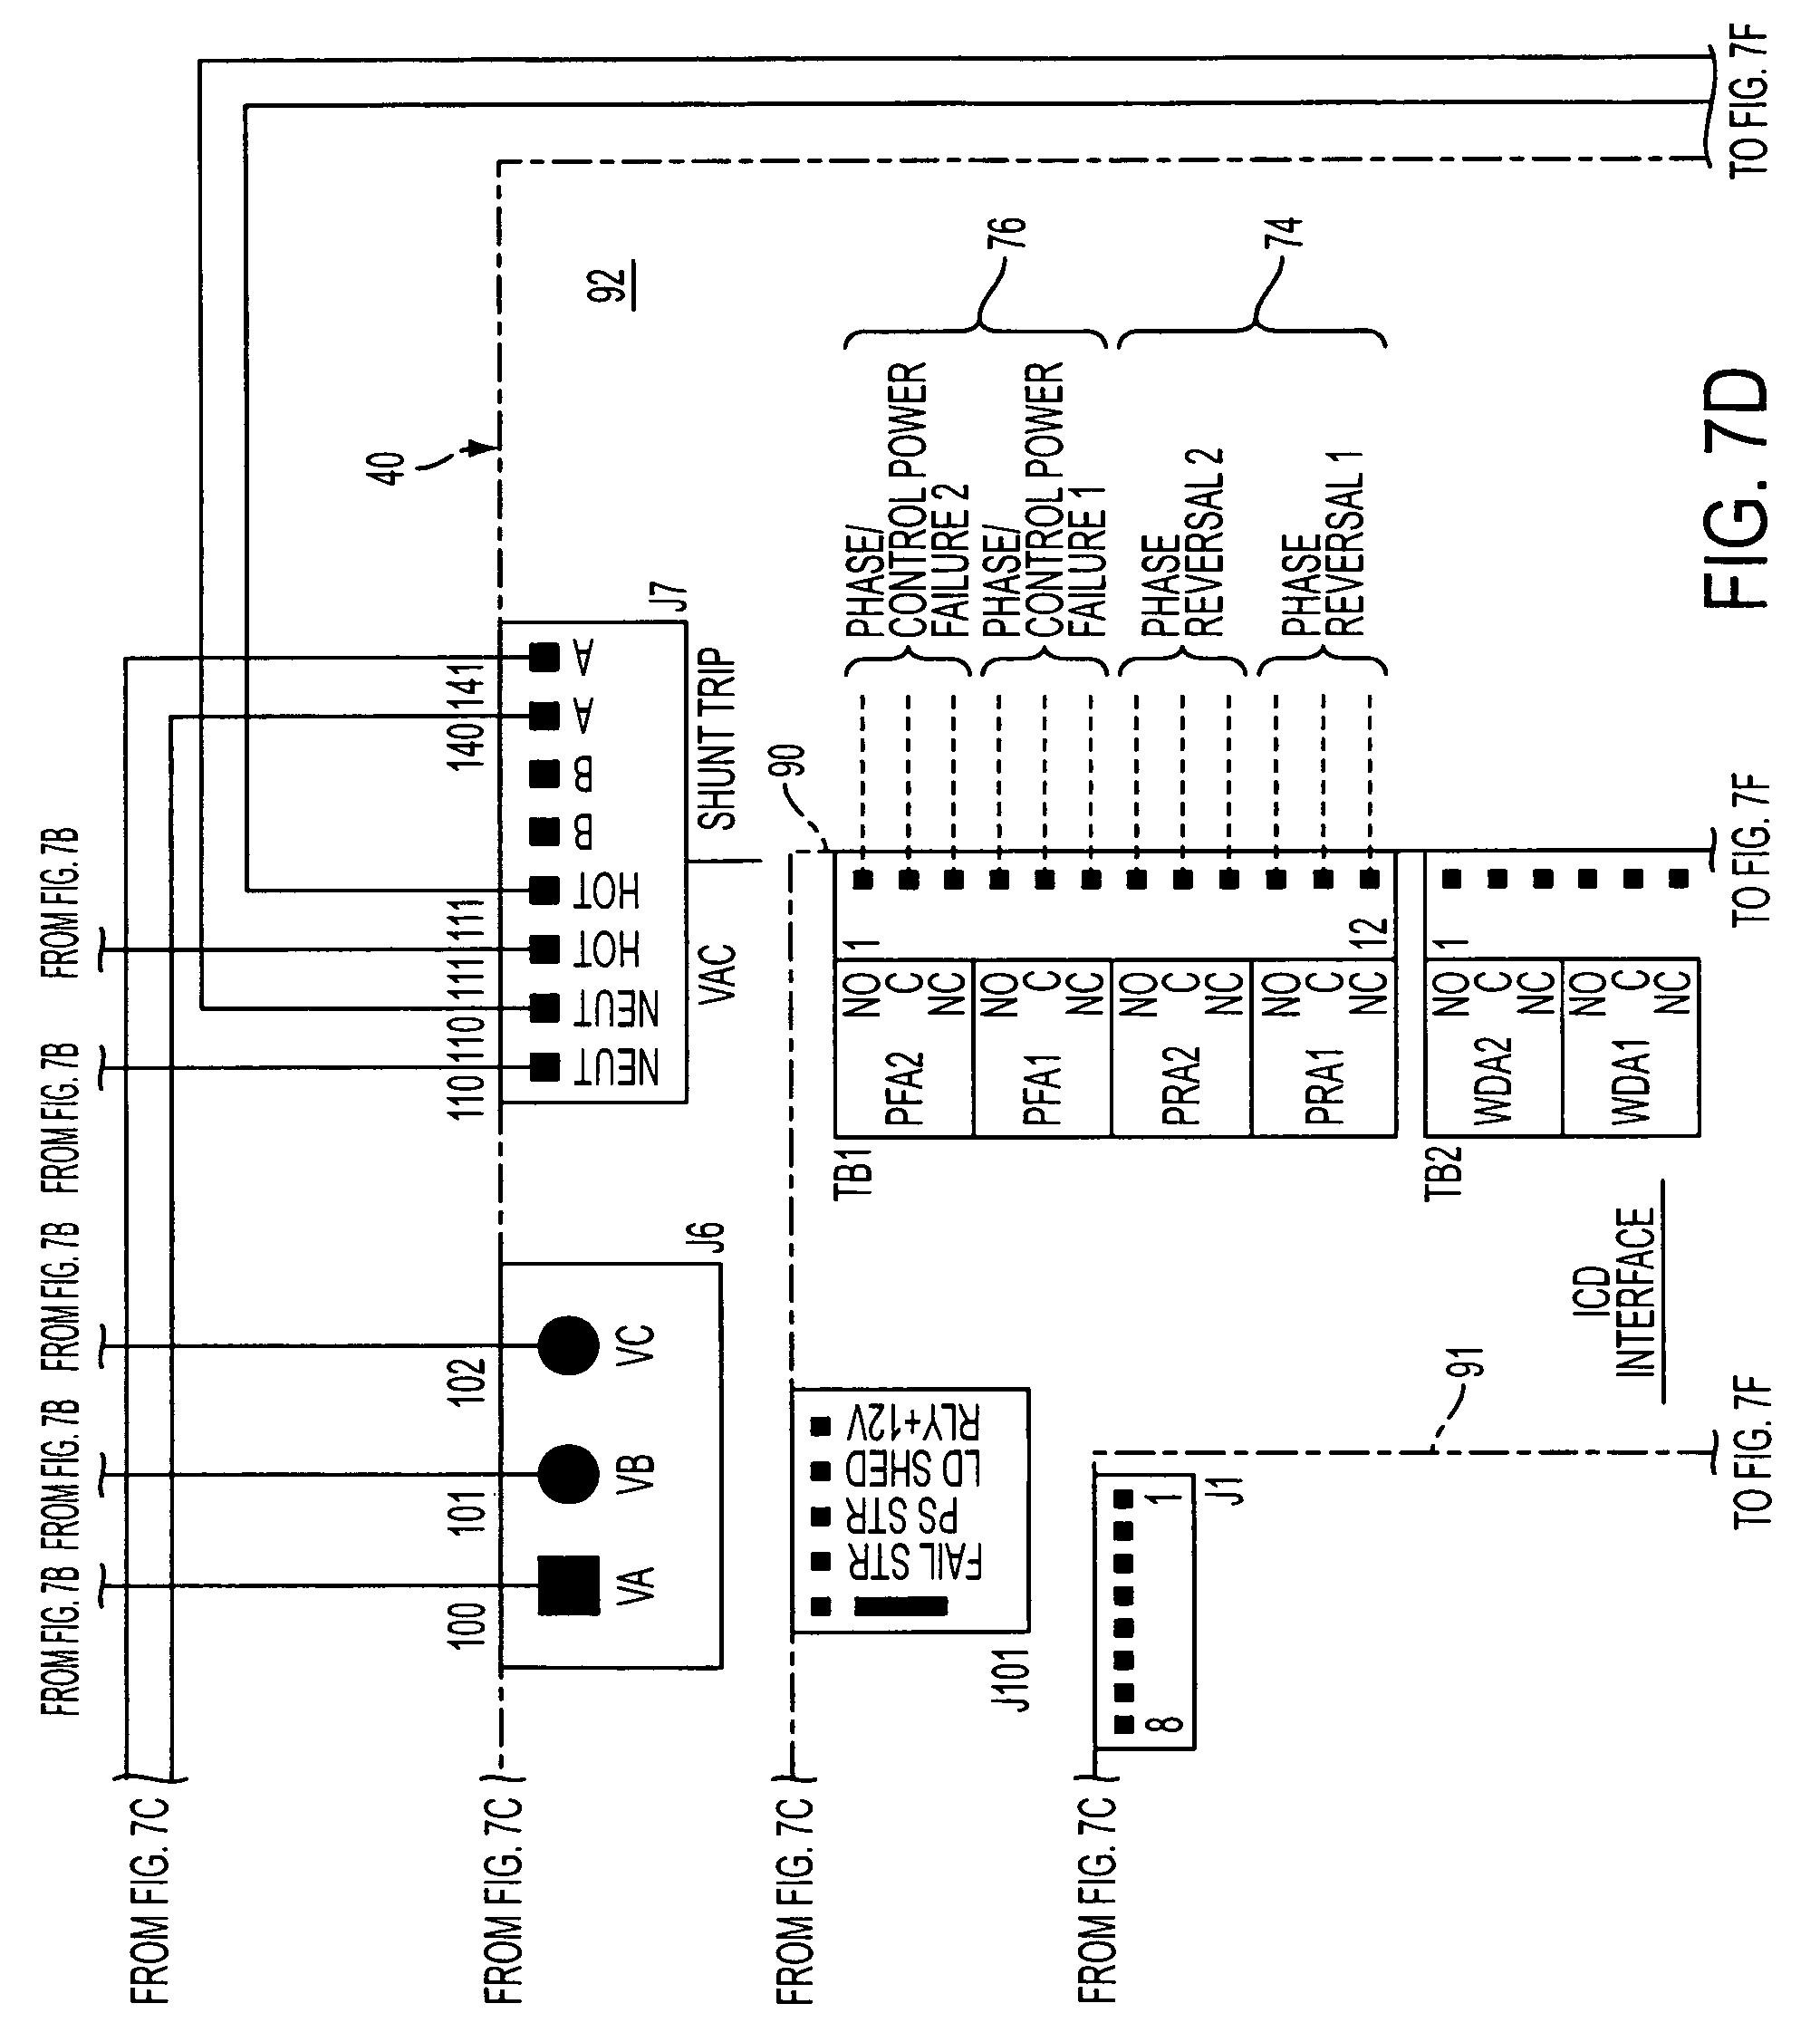 Wiring Diagram For Duct Smoke Detectors - Hdmi To Rca Wiring Diagram -  power-poles.yenpancane.jeanjaures37.frWiring Diagram Resource